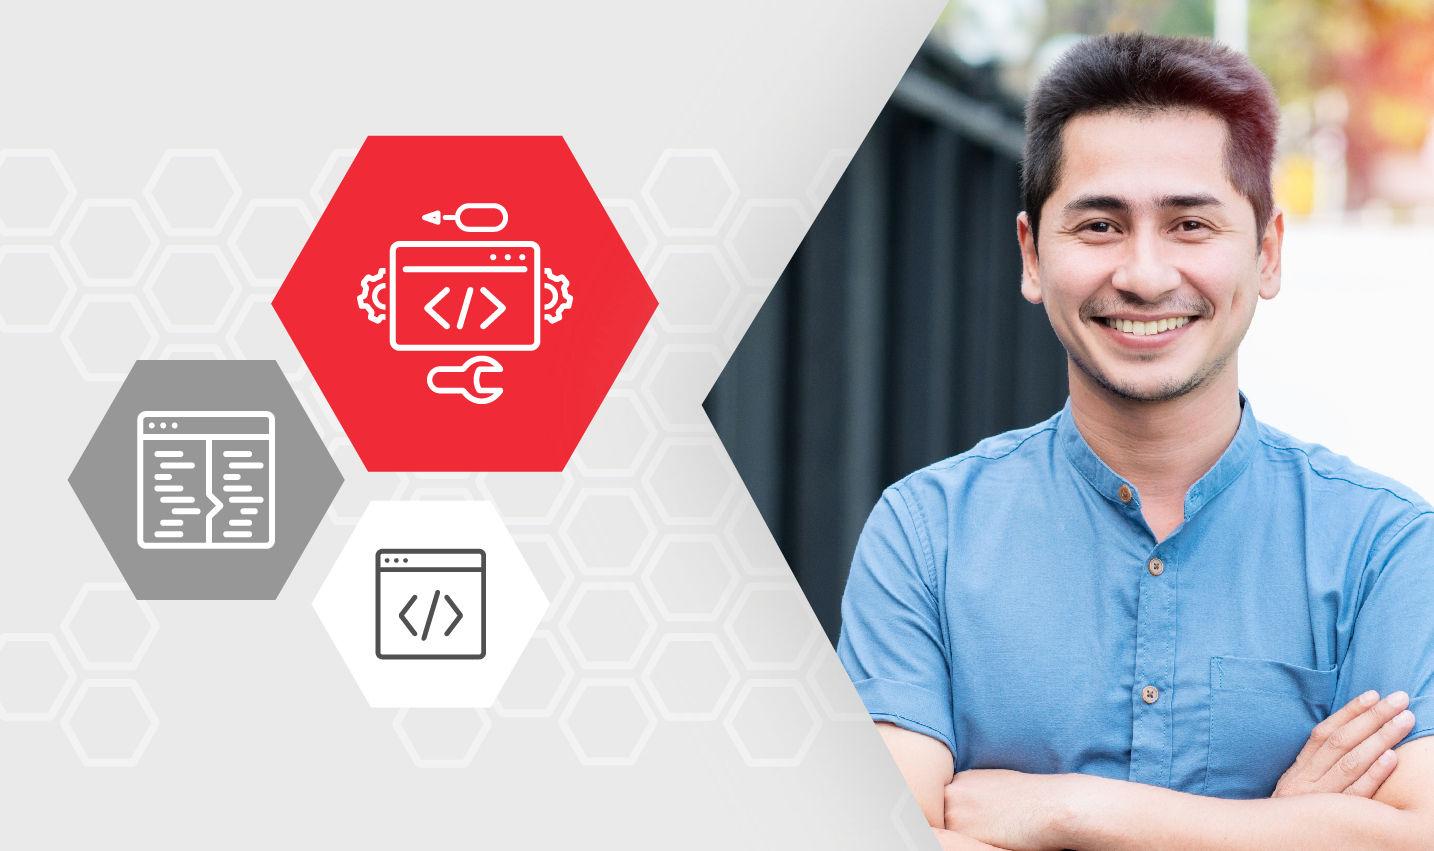 UpGrad Digital Marketing Program Review- PG Diploma in Software Development